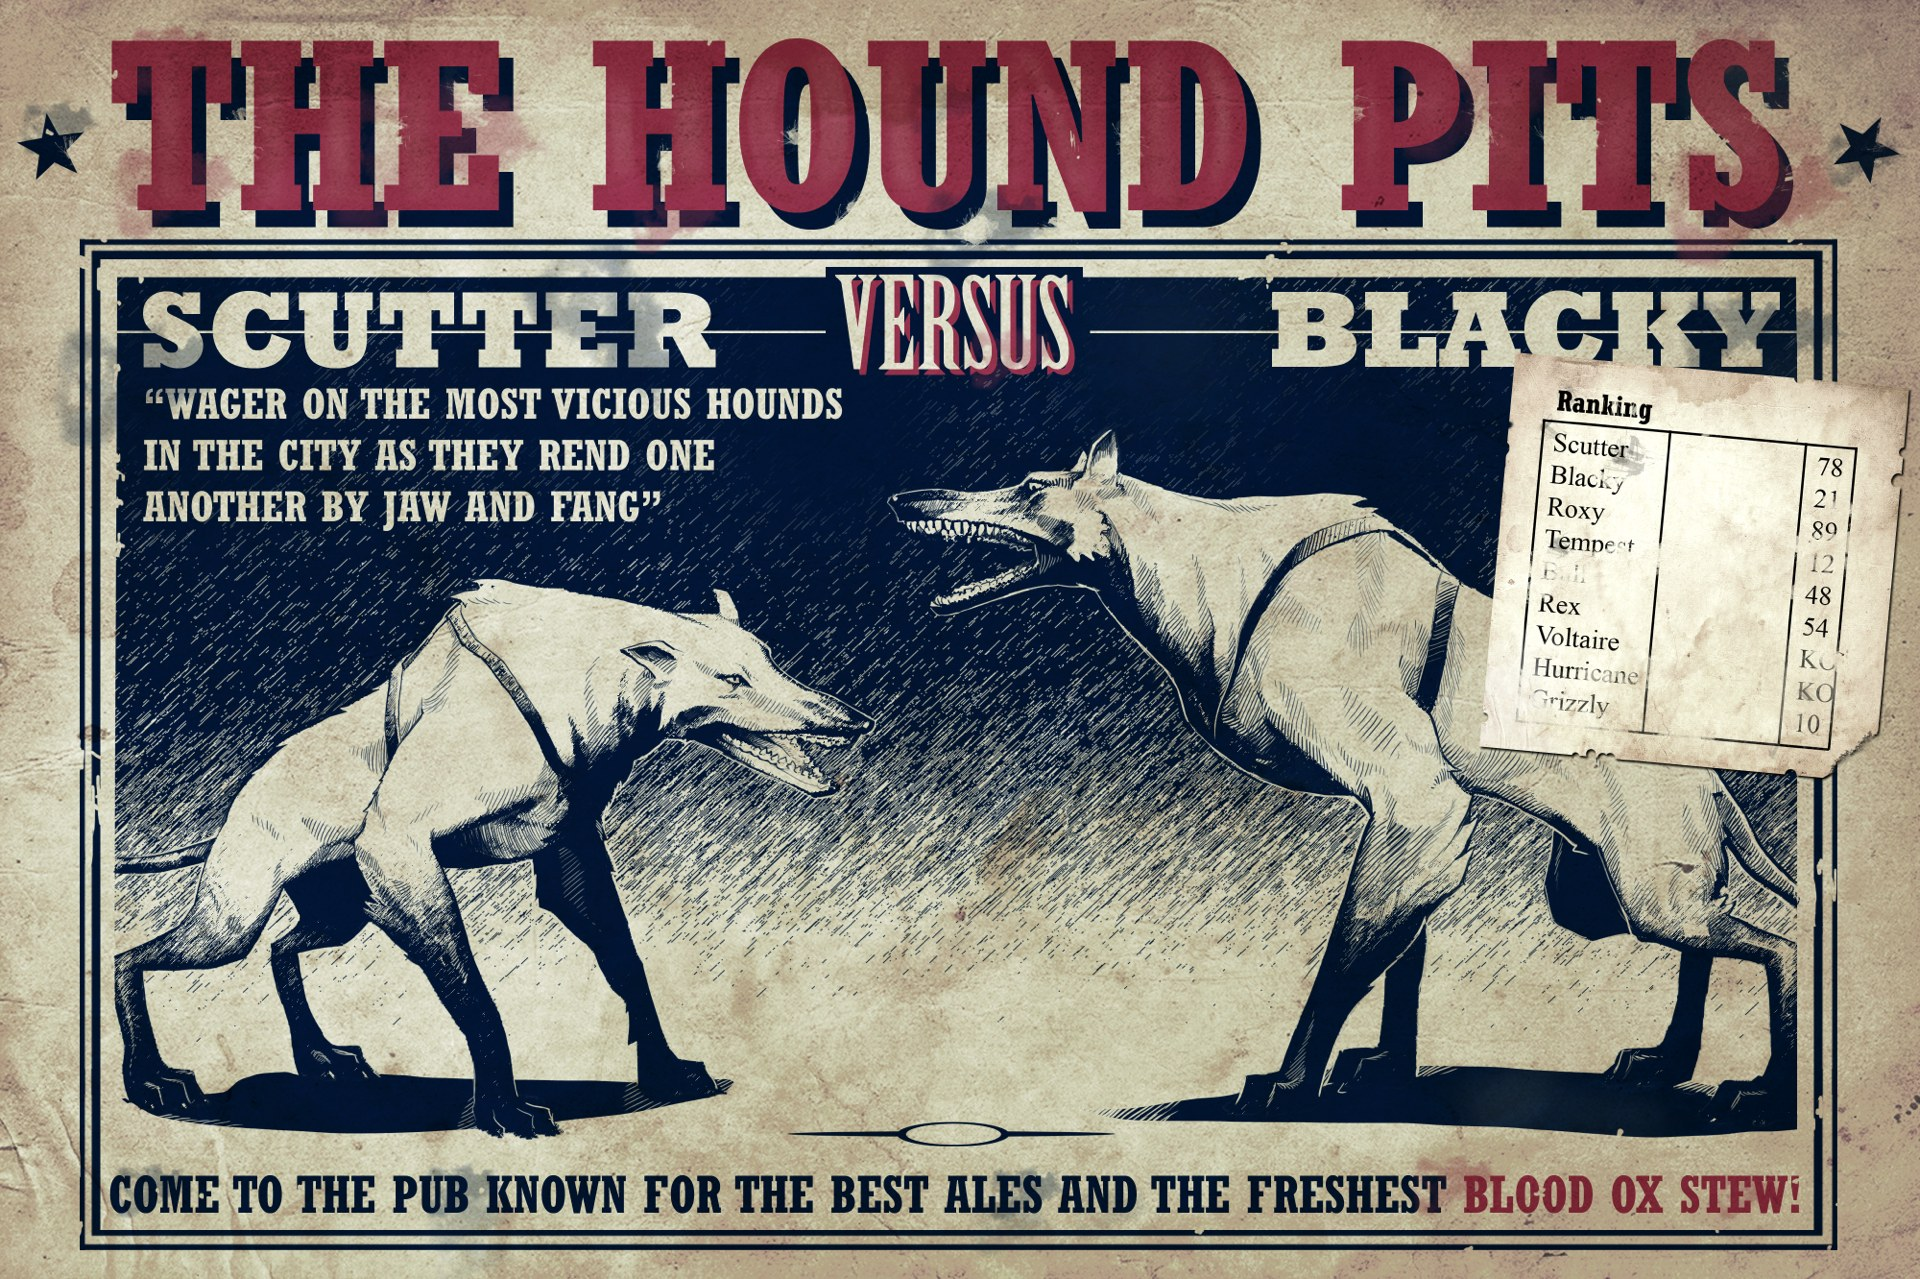 Image Poster Hound Pits Jpg Dishonored Wiki Fandom